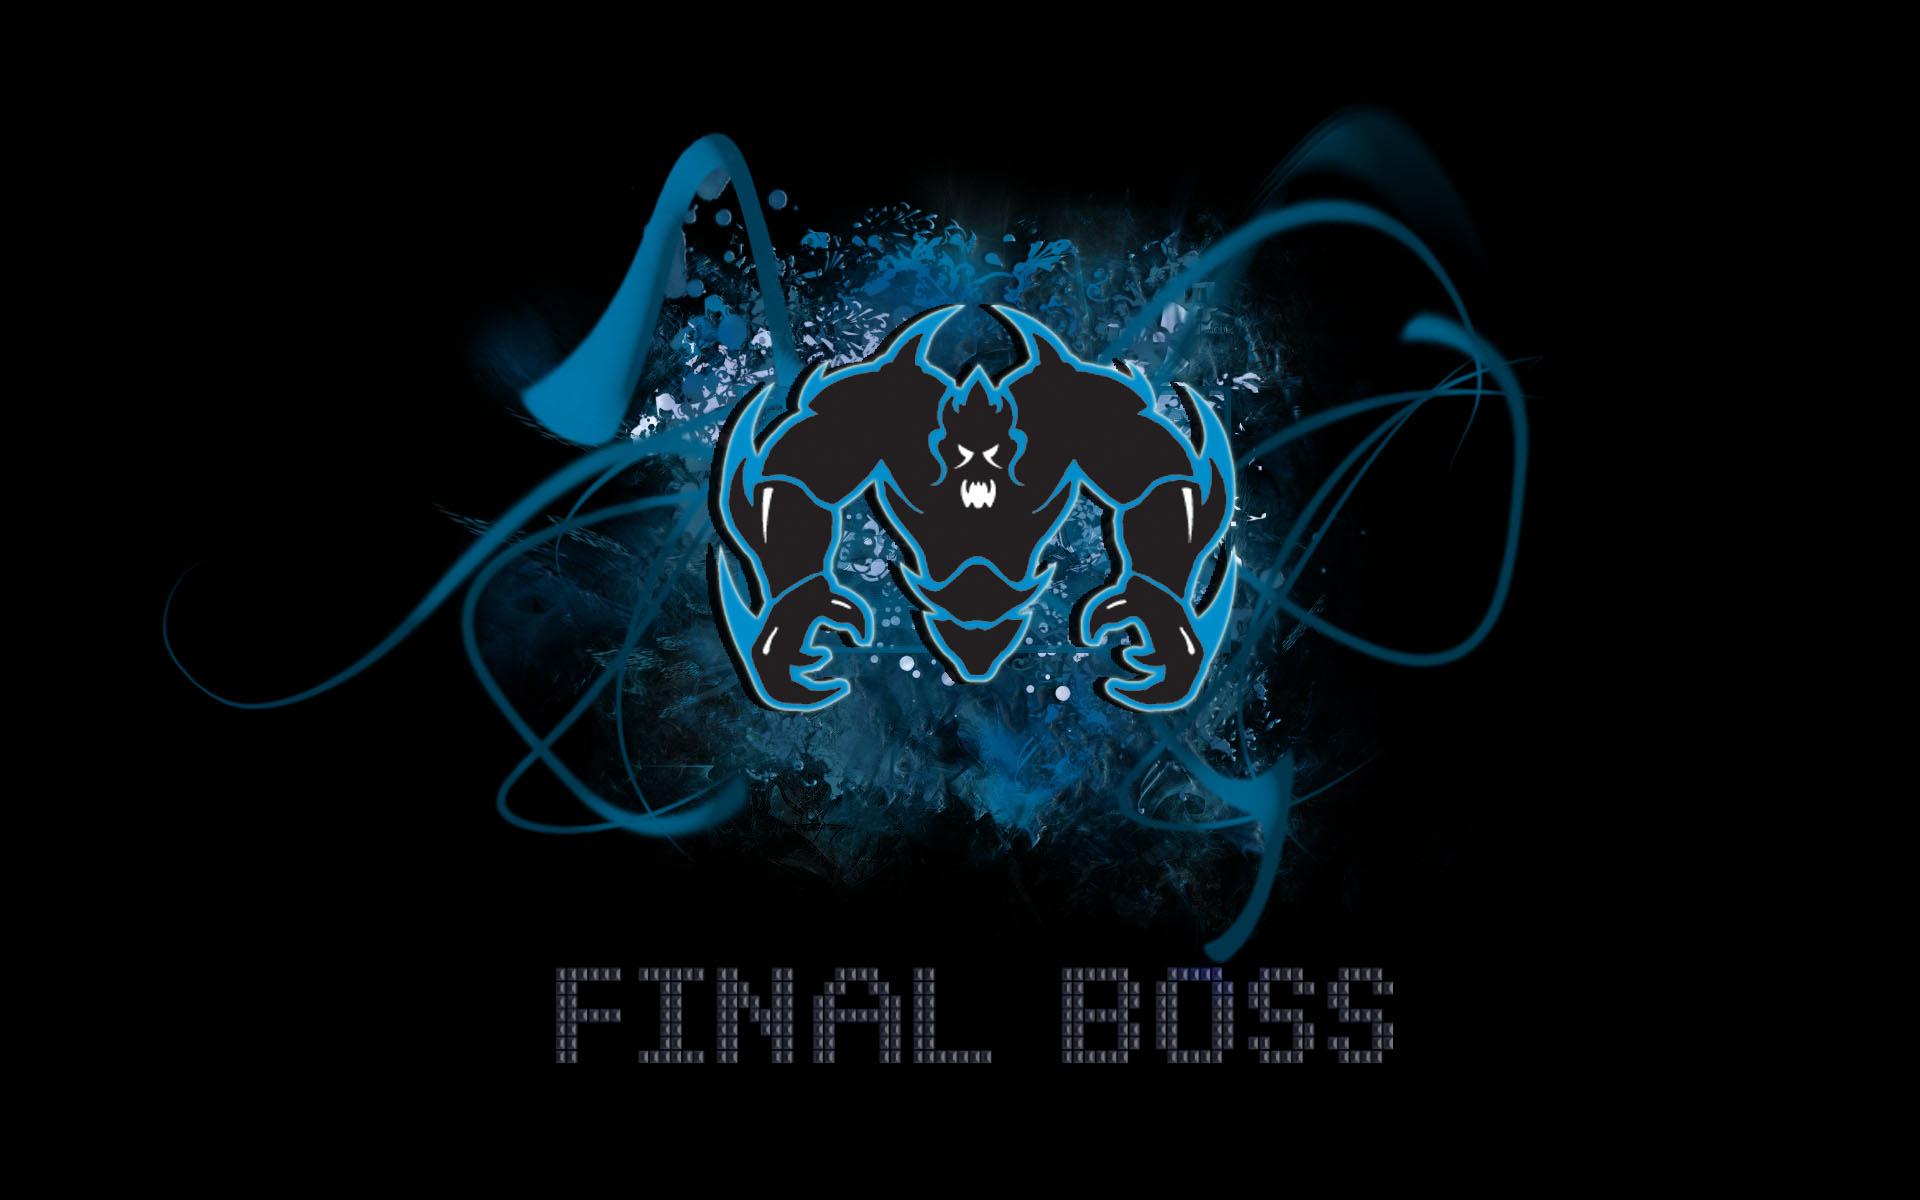 [Imagen: Final_Boss_Wallpaper_by_iTzDoCiLe.jpg]